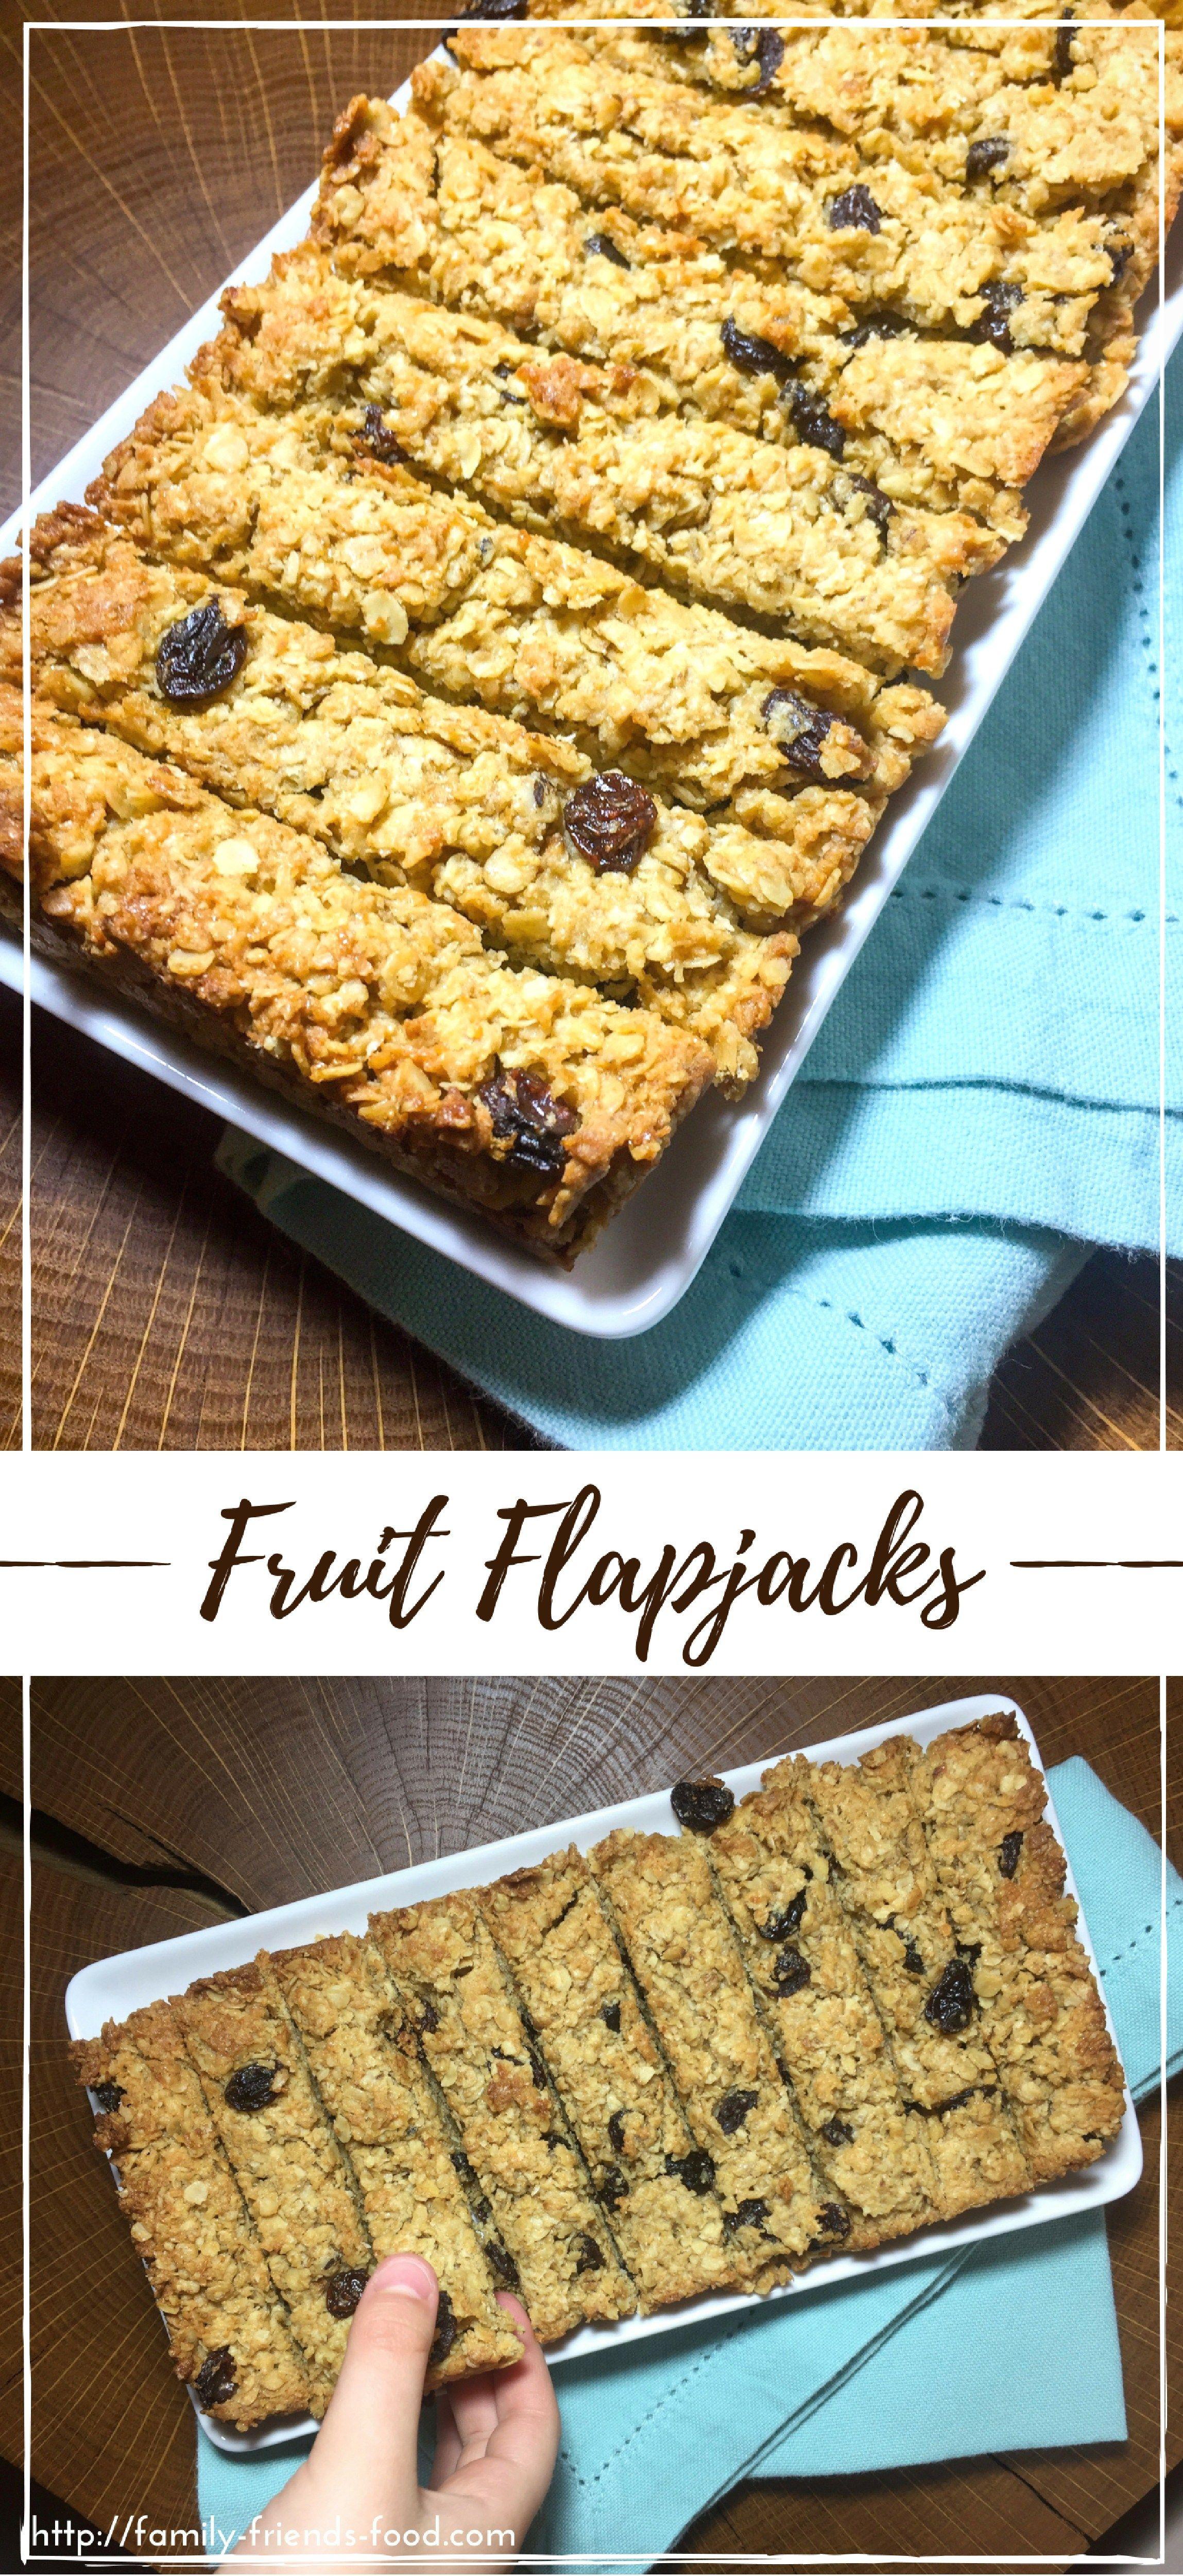 47 Recipe Tasty Fruity Flapjacks: Baking, Food, Recipes